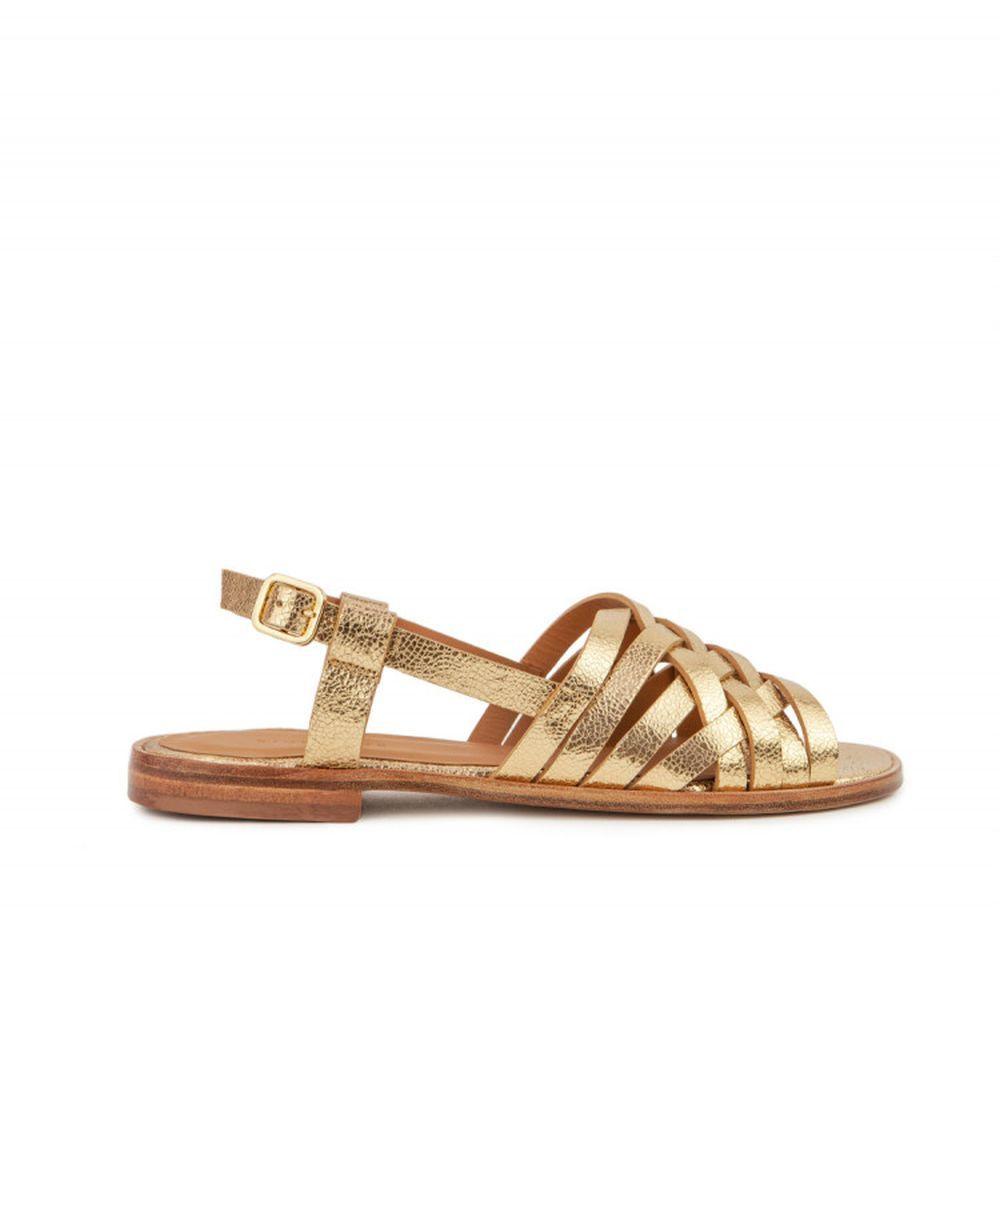 Sandalias de Rivecour